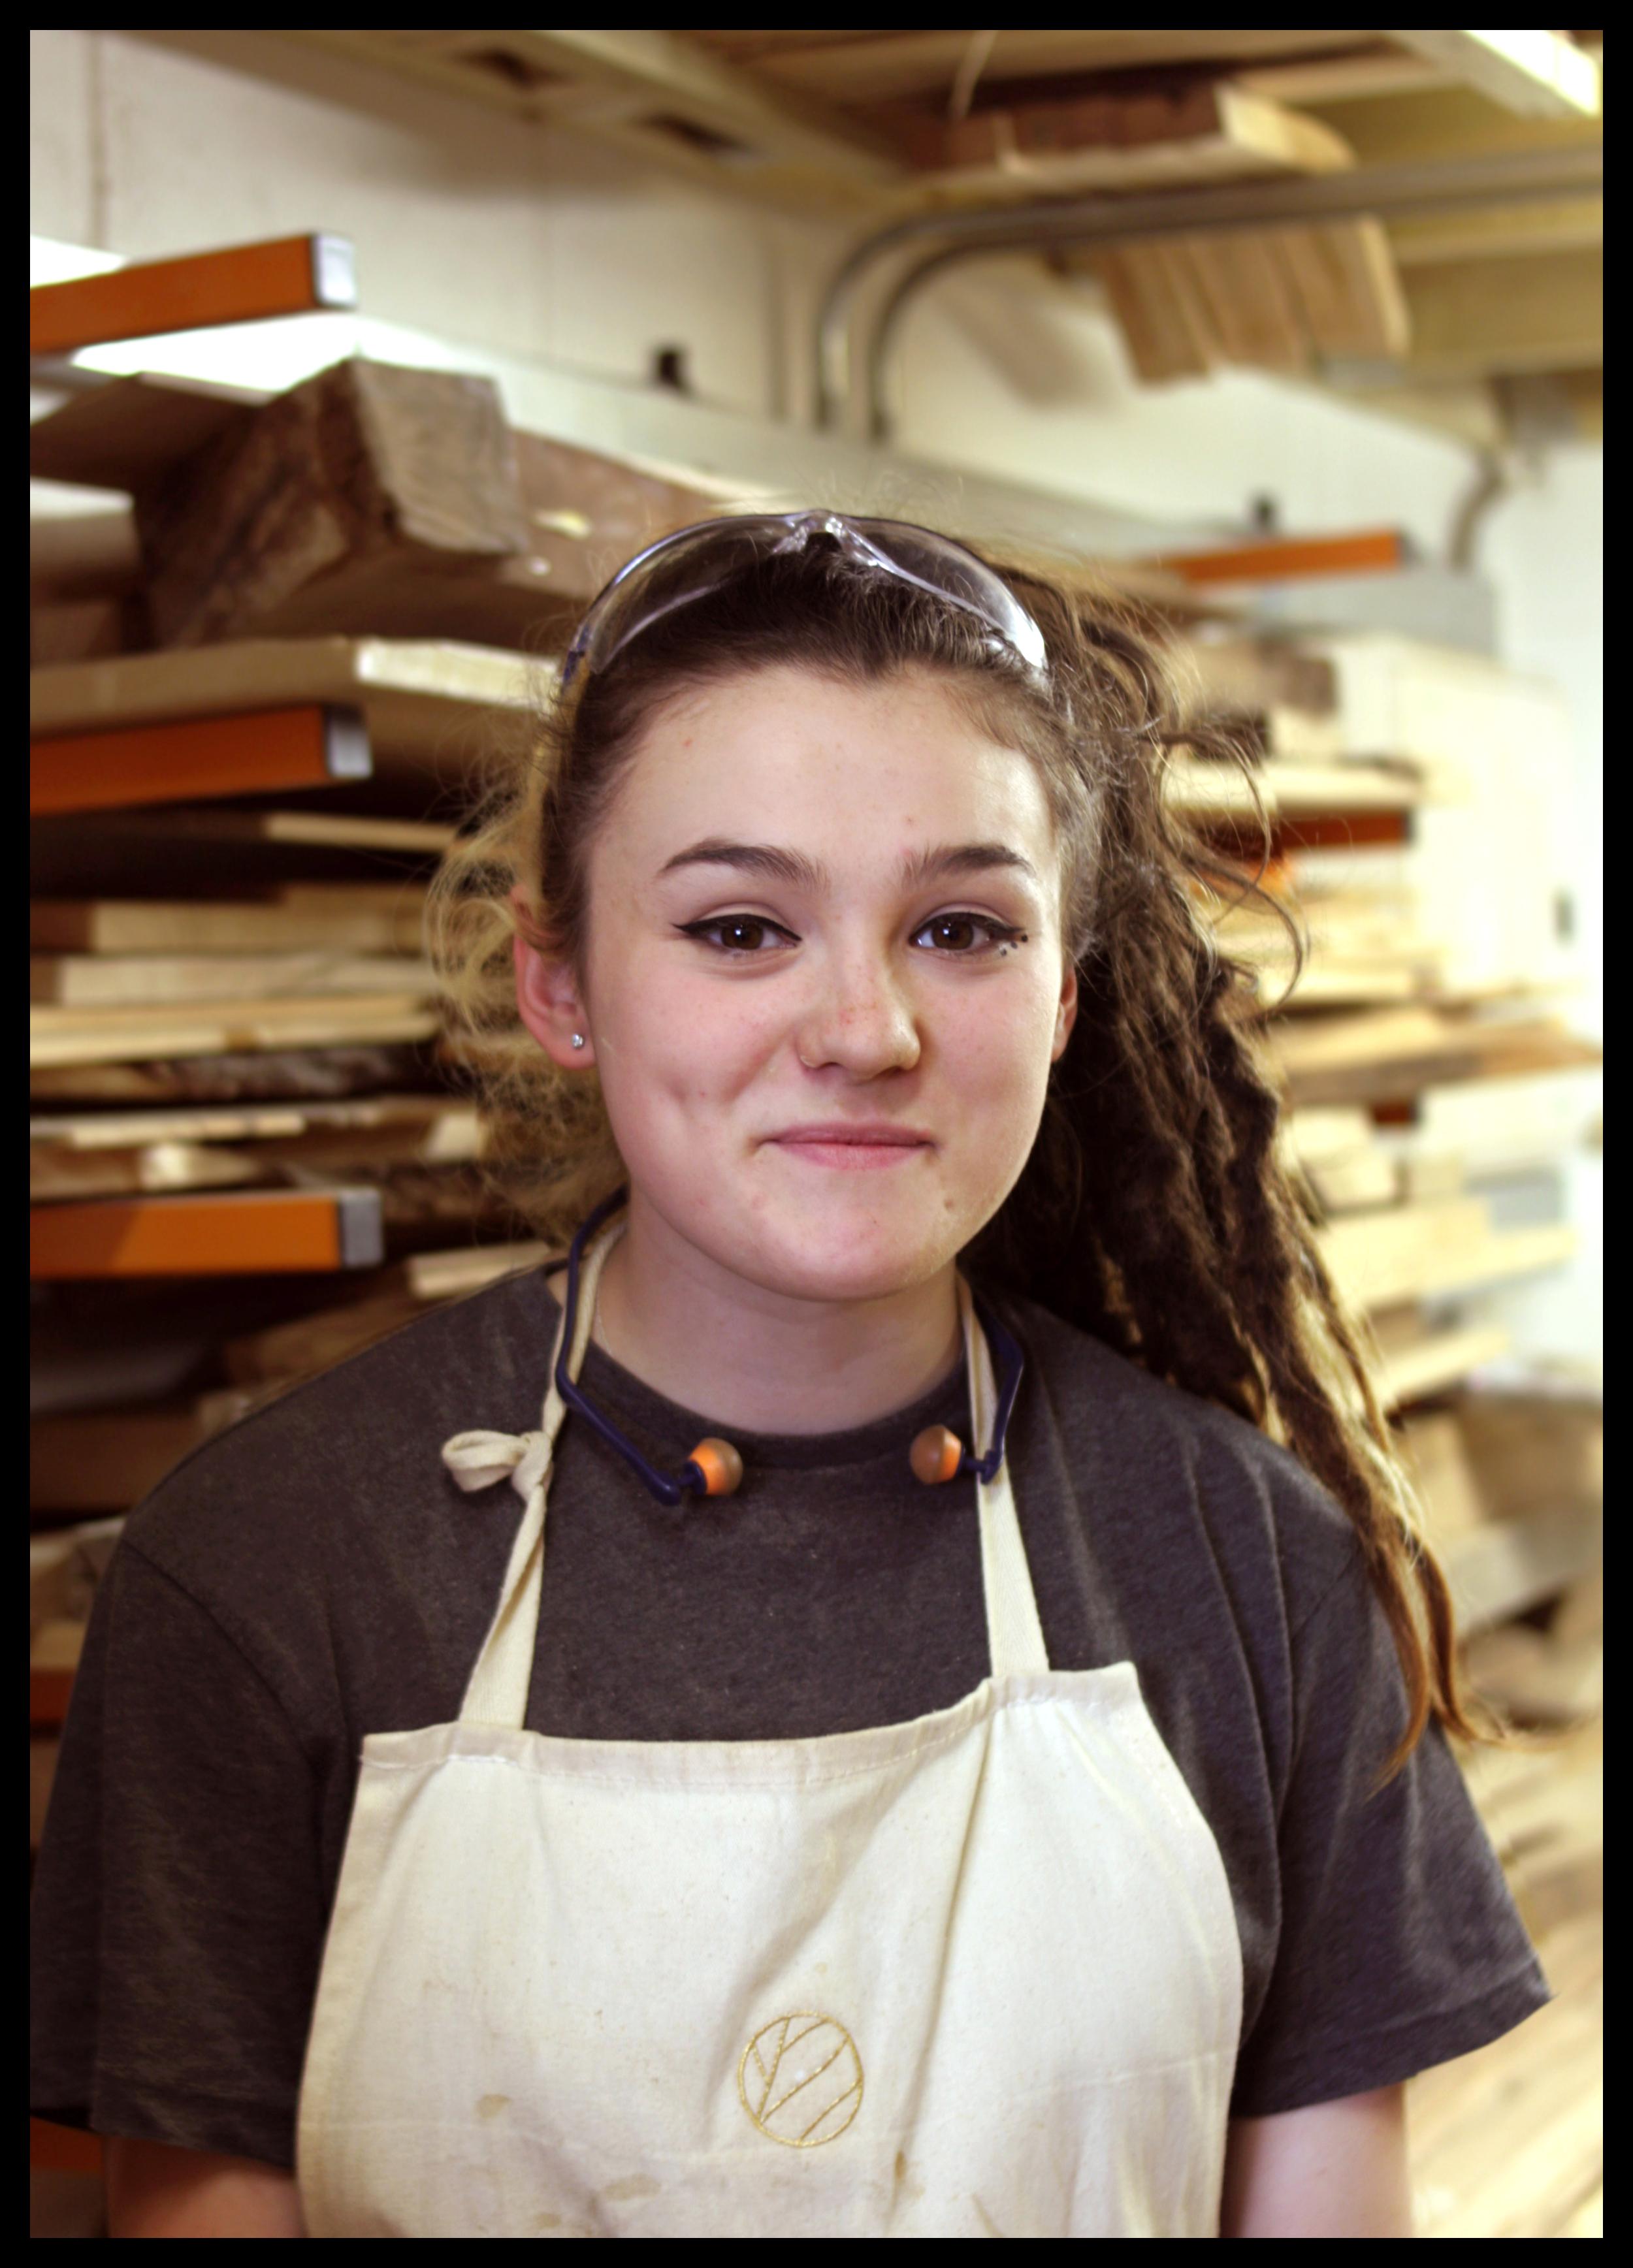 Indira Esser Dunbar - workshop apprentice